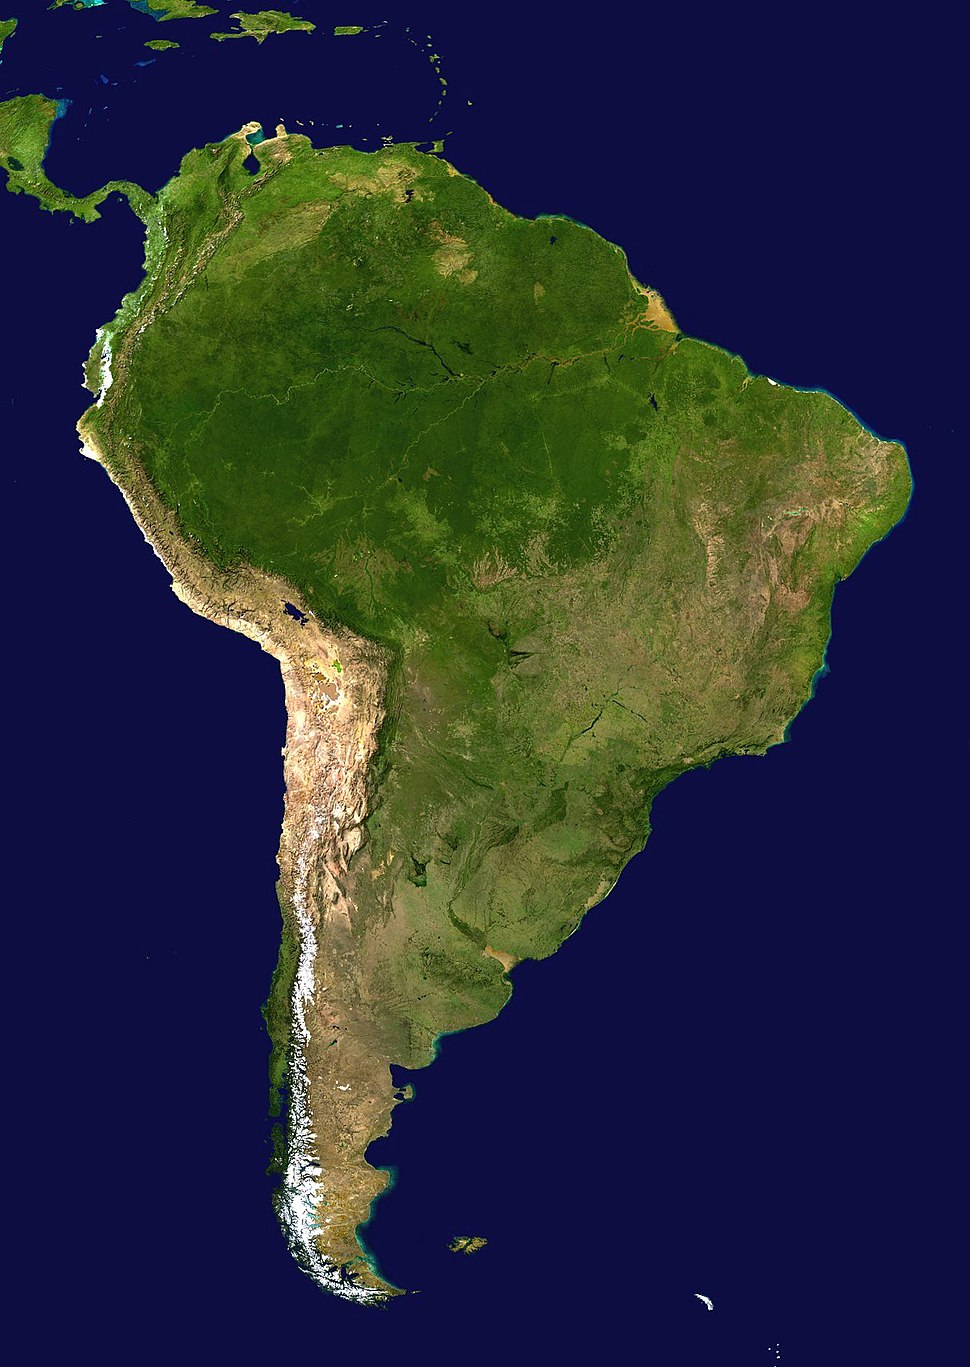 South America satellite orthographic